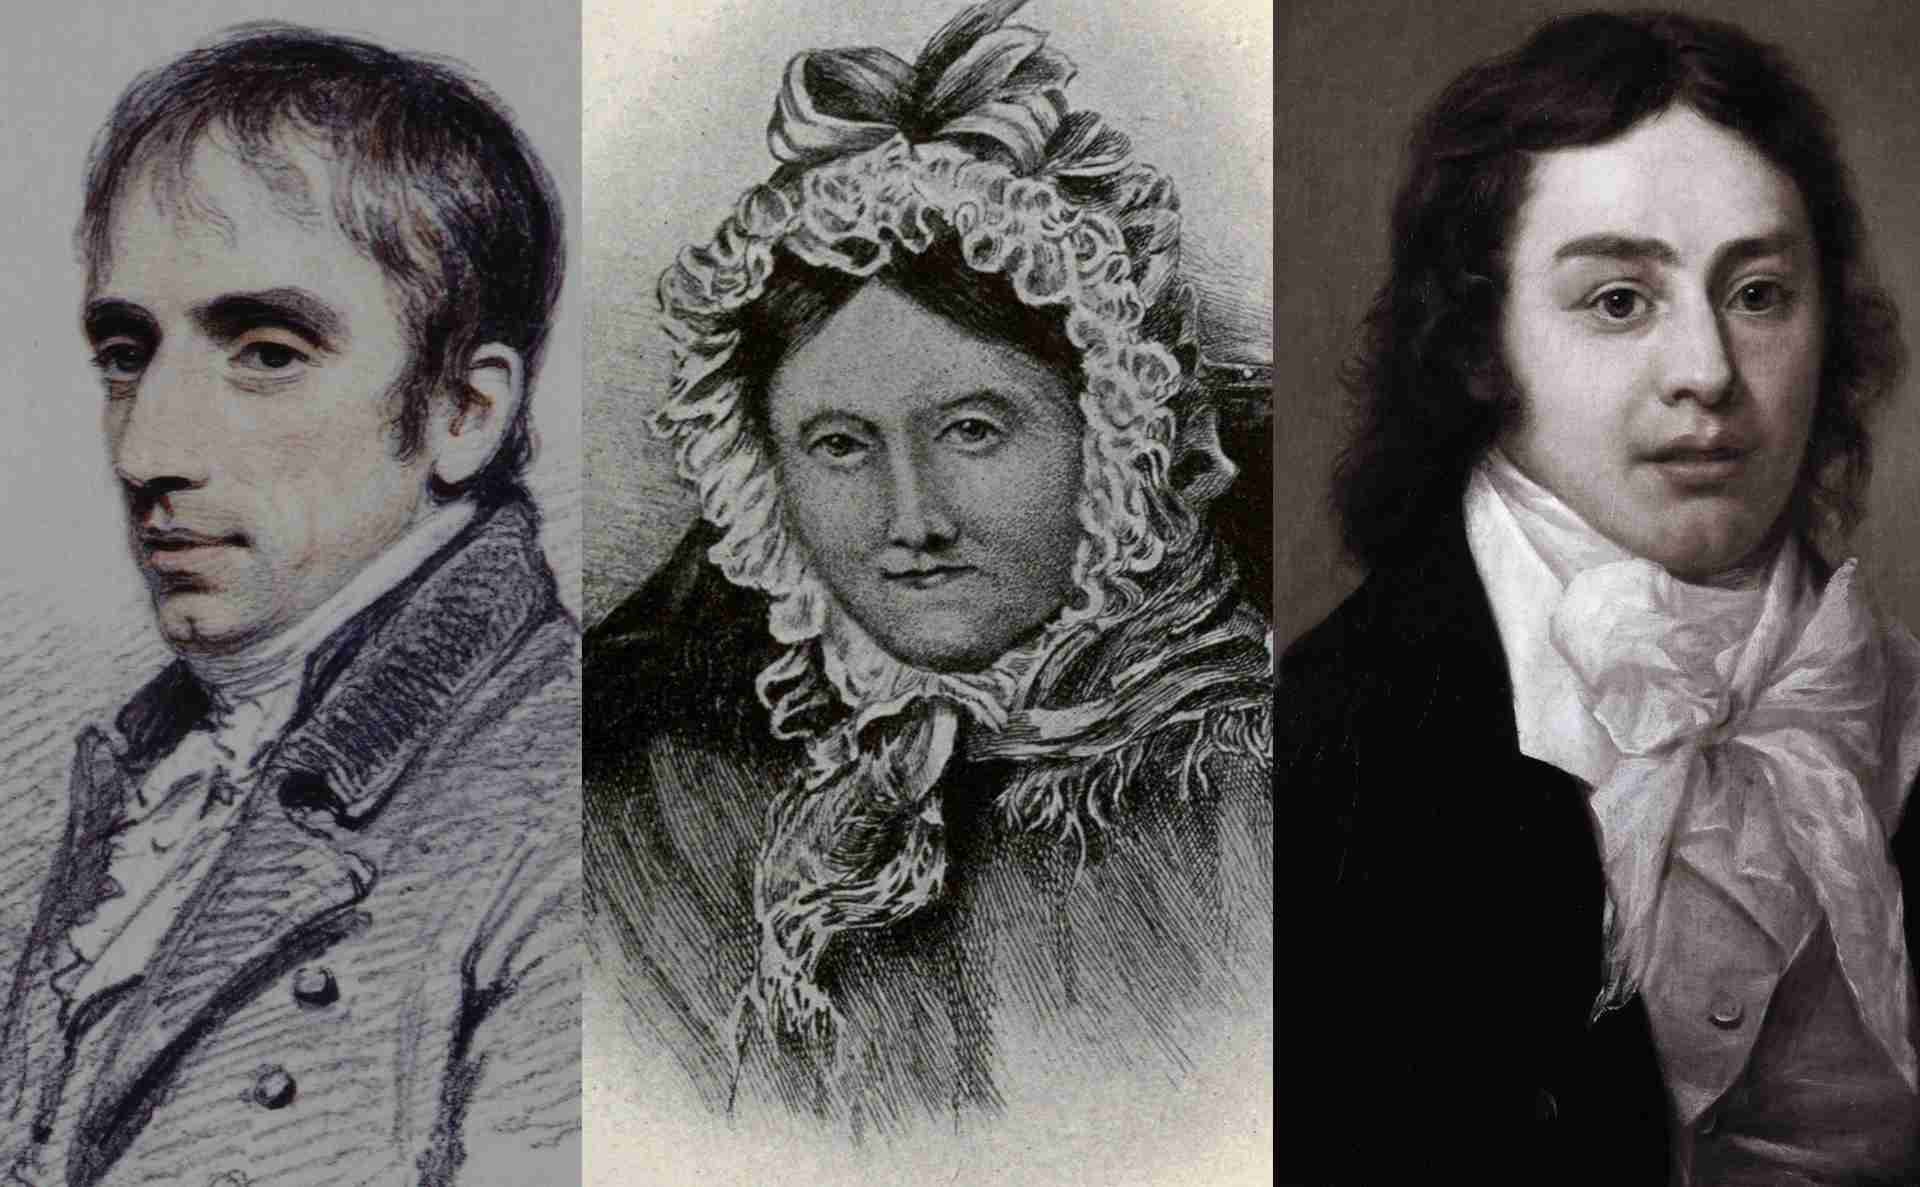 William and Dorothy Wordsworth with Samuel Taylor Coleridge